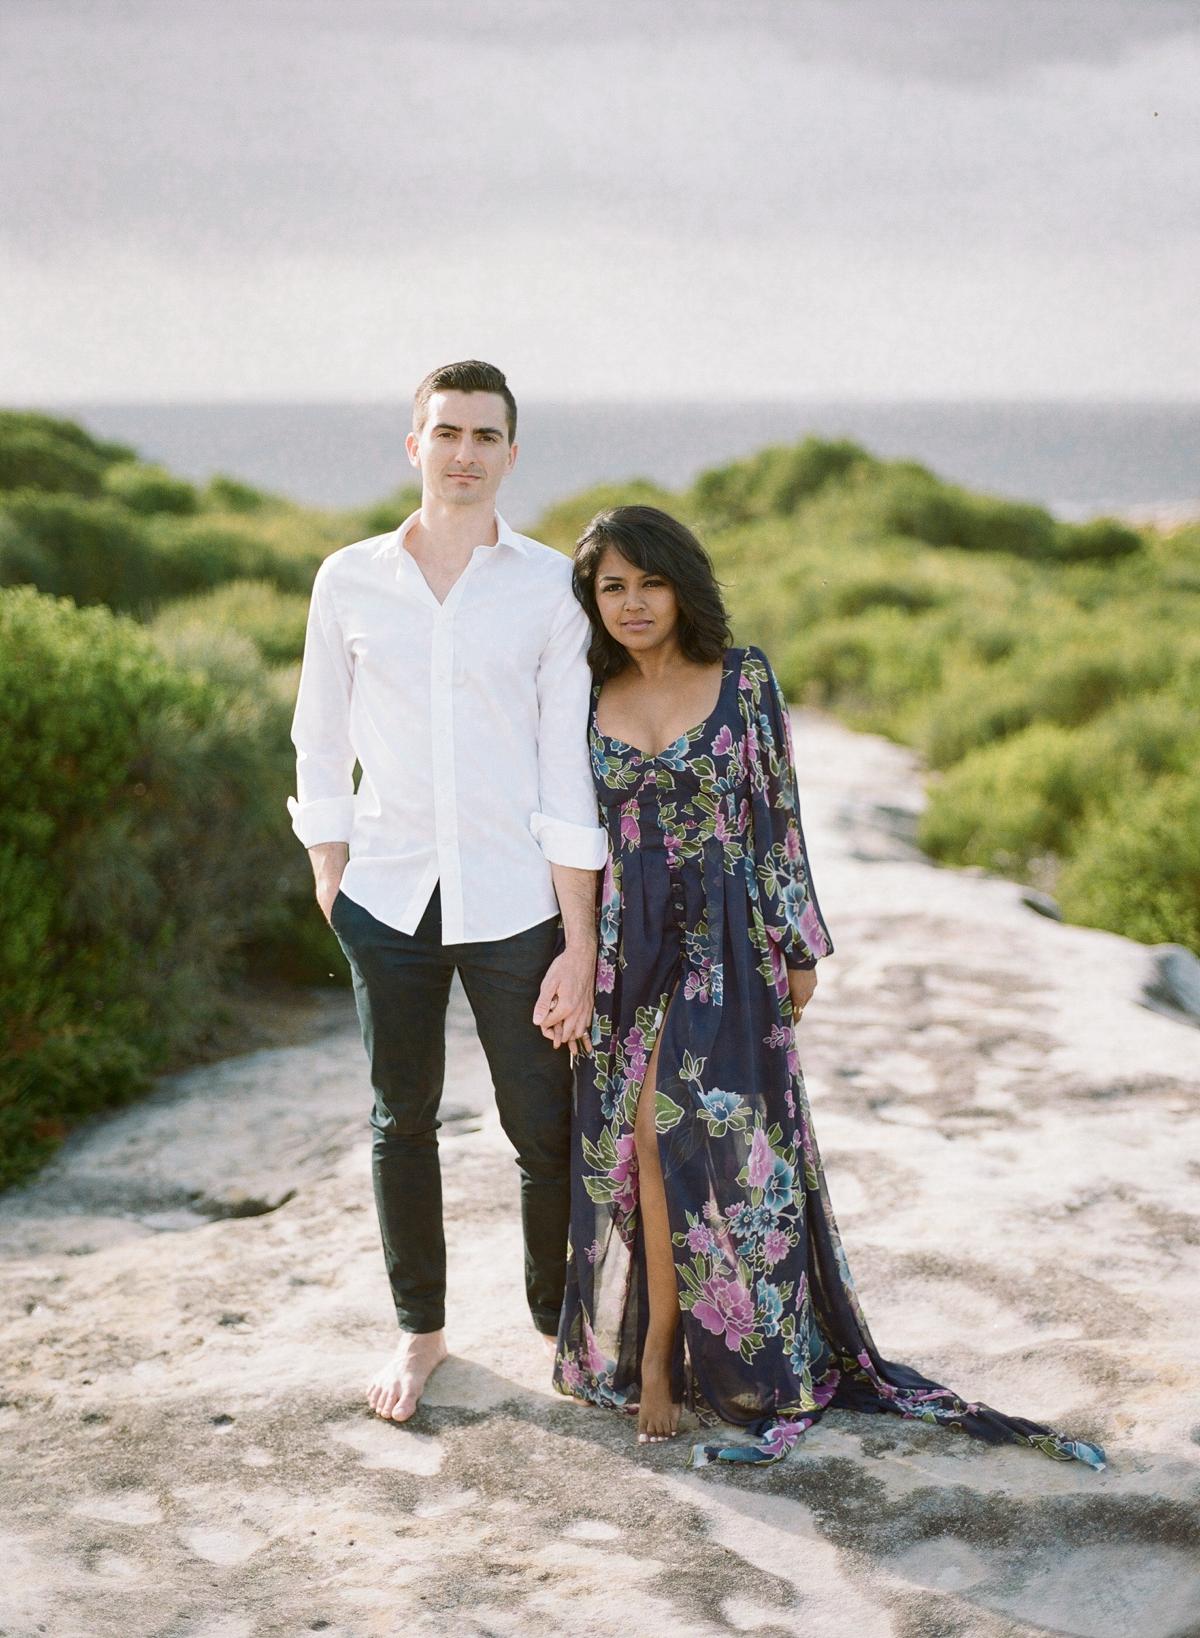 Coastal Sydney couples session by Mr Edwards Photography_0737_1173.jpg